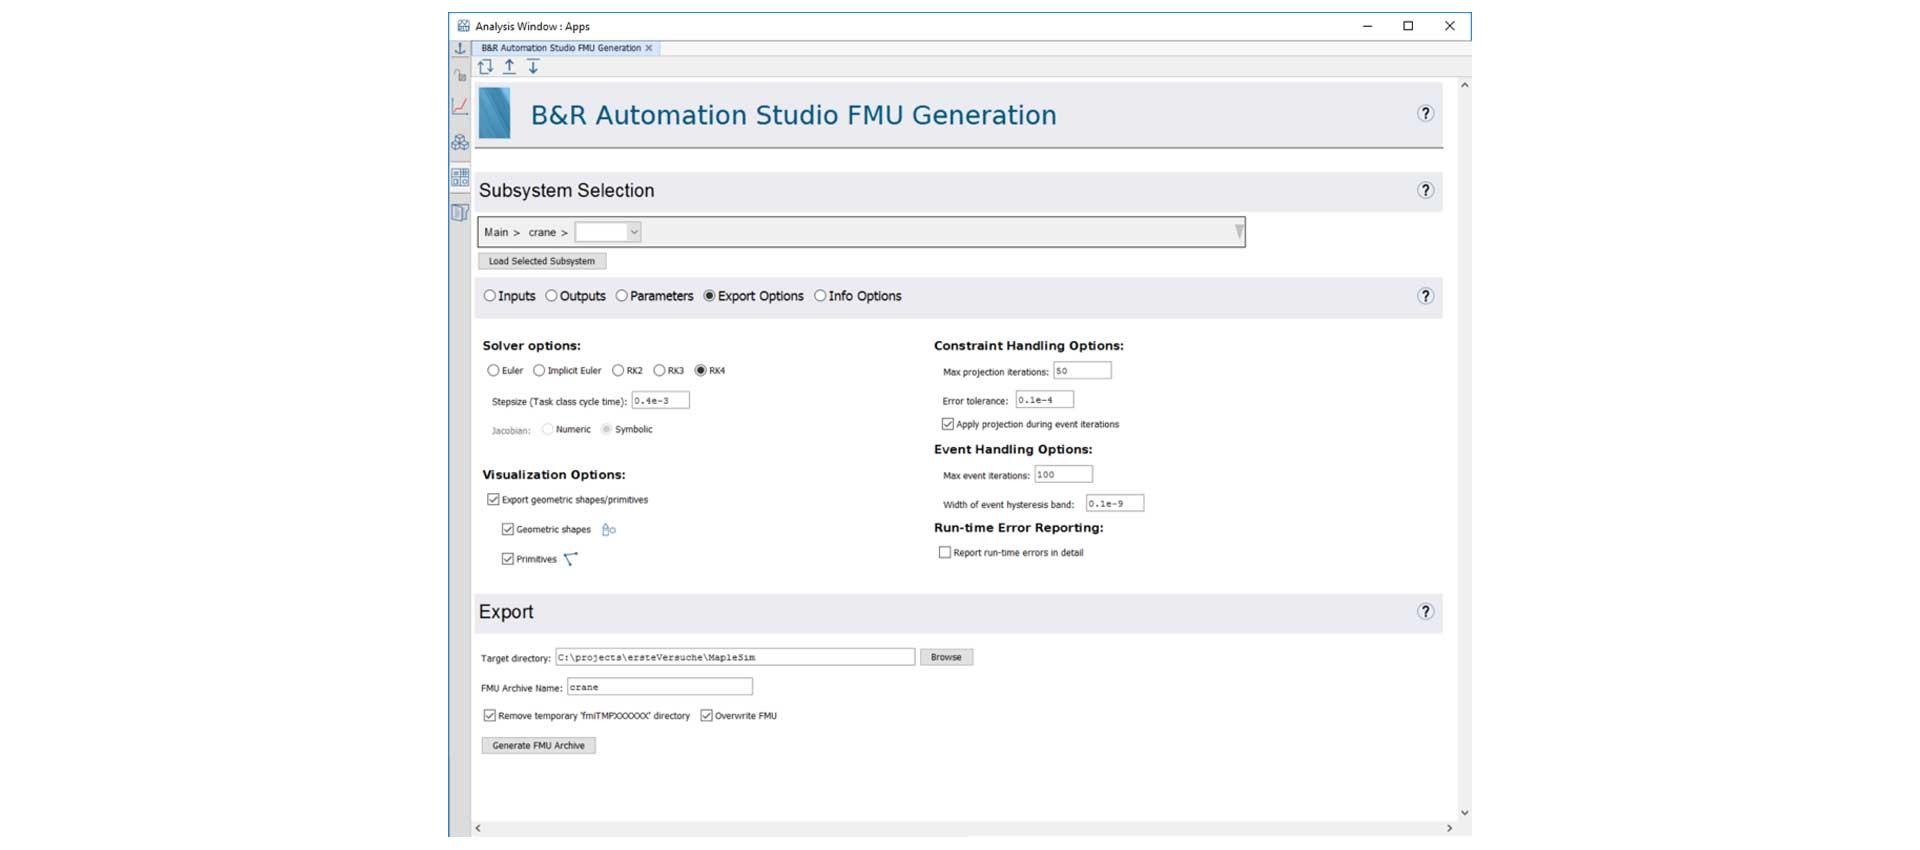 The B&R Automation Studio FMU Generation App.